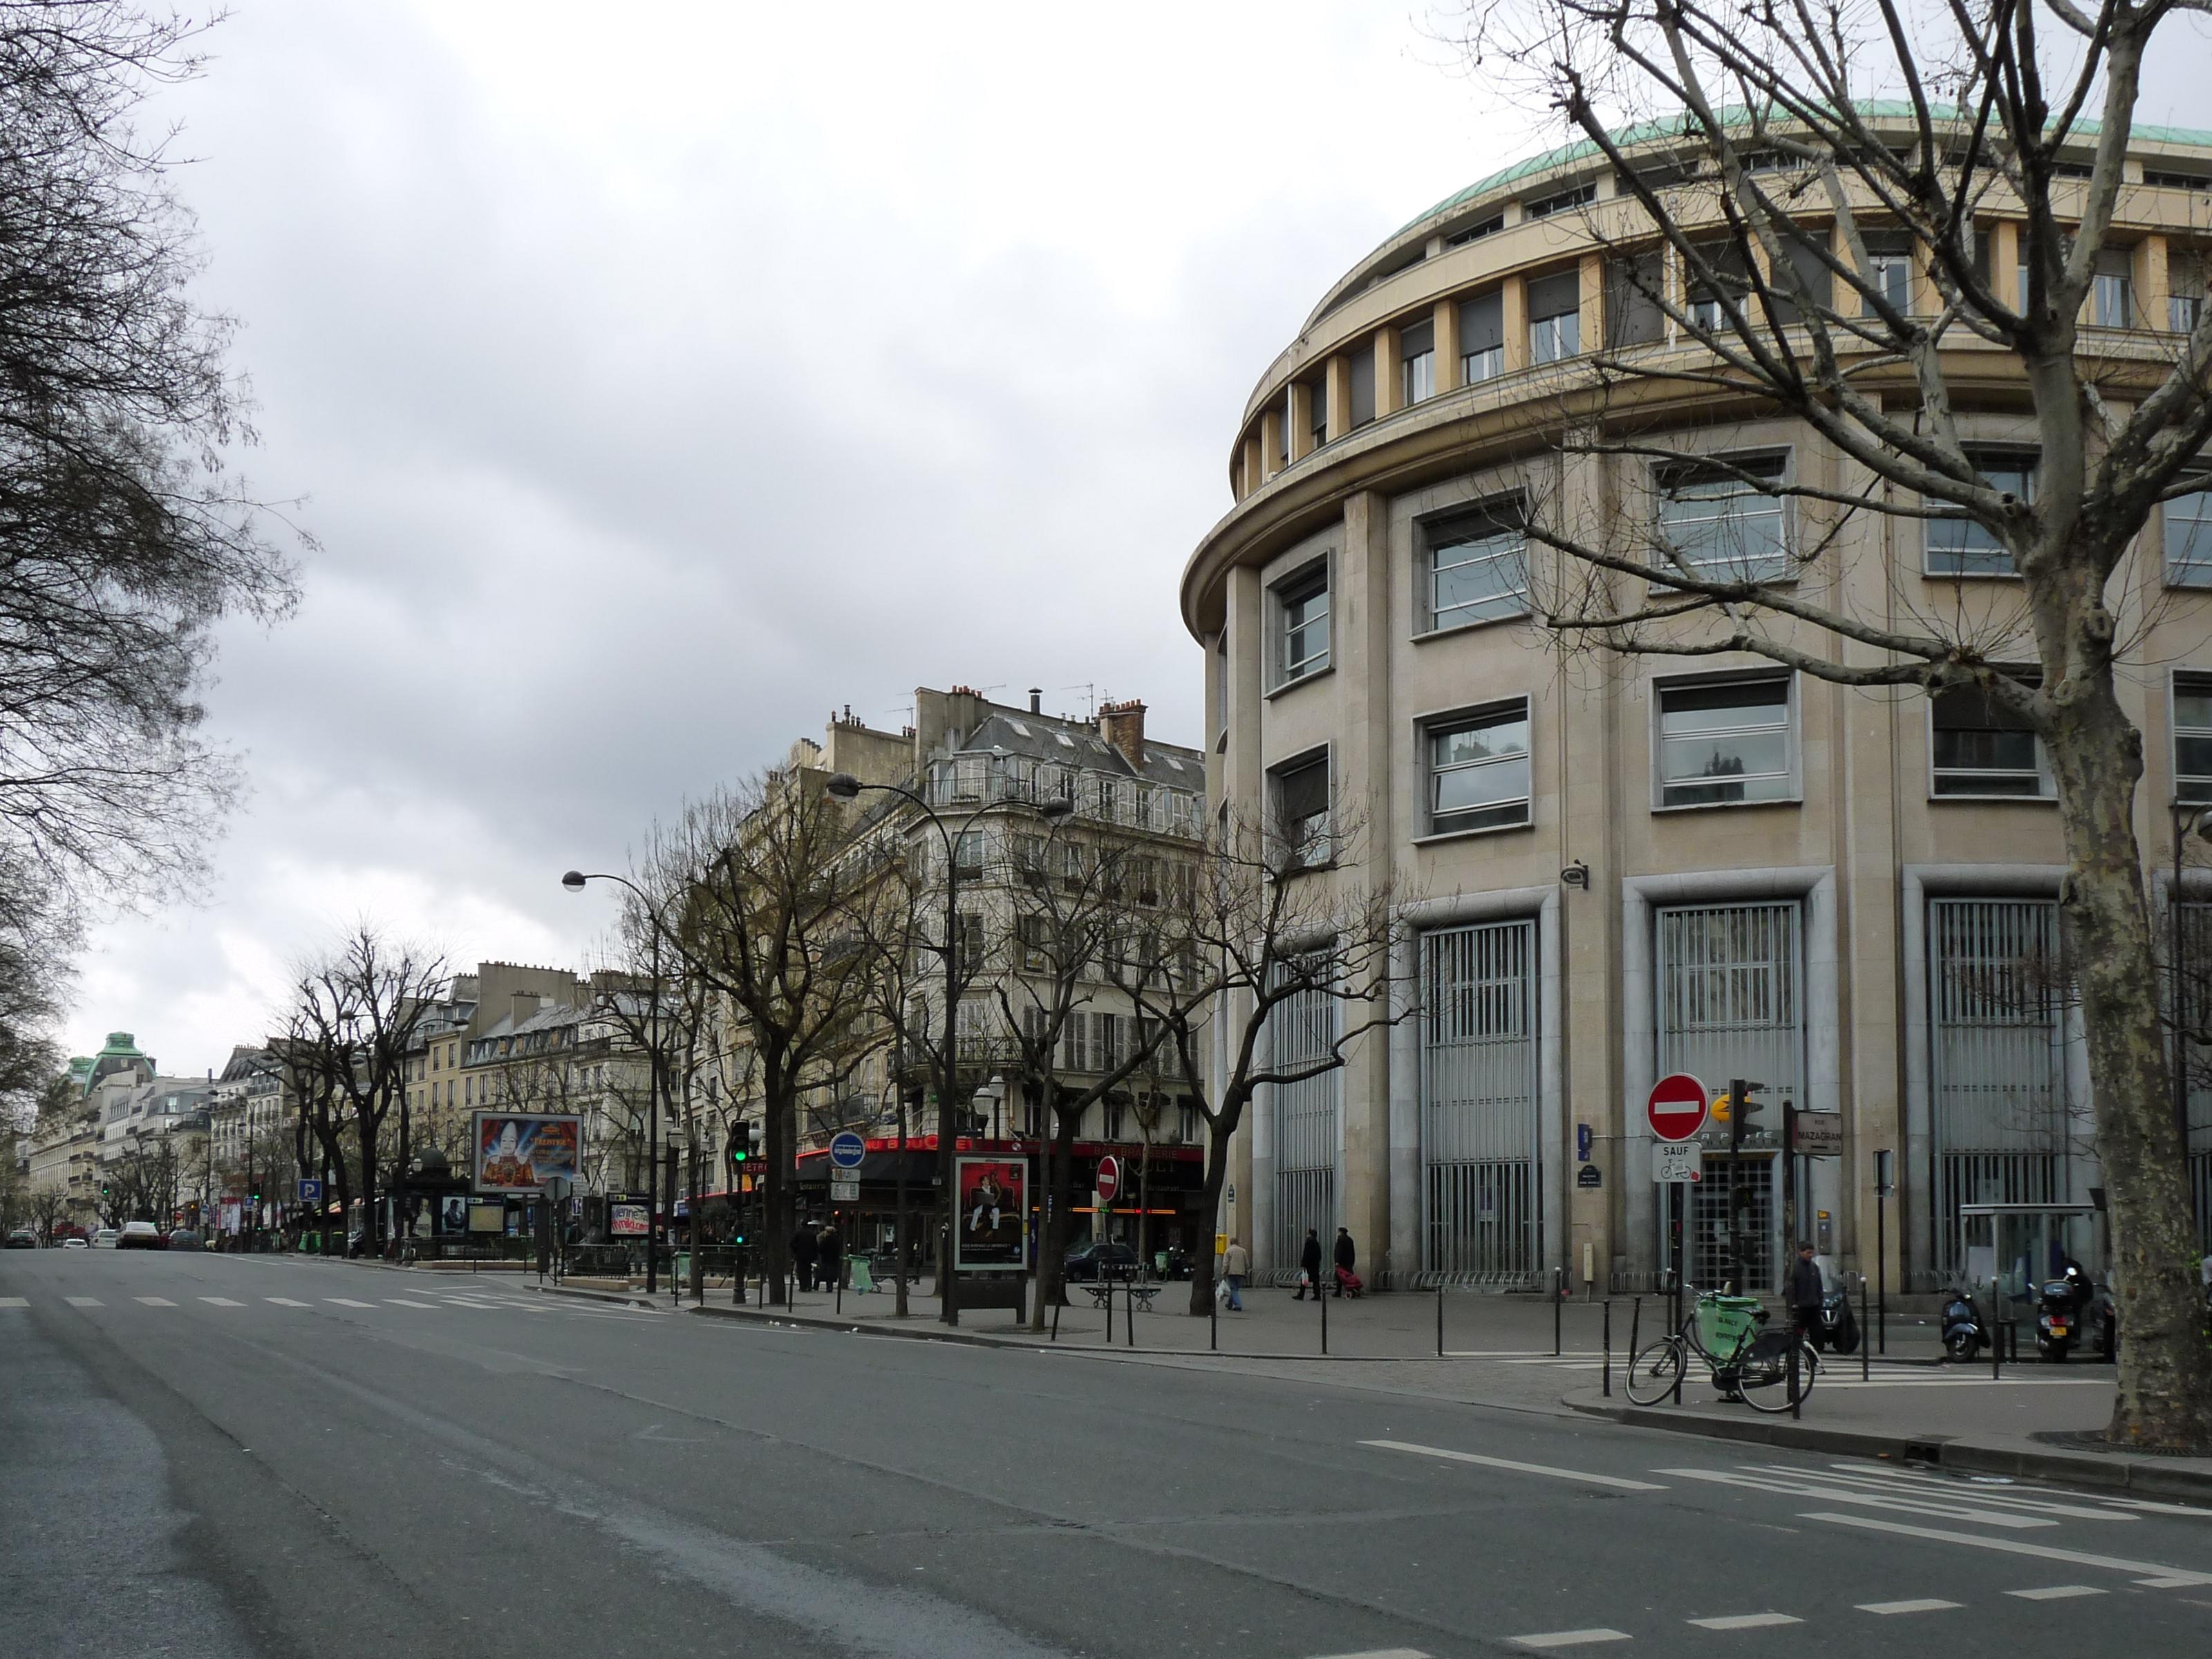 Boulevard Bonne Nouvelle Delaville Caf Ef Bf Bd  Paris